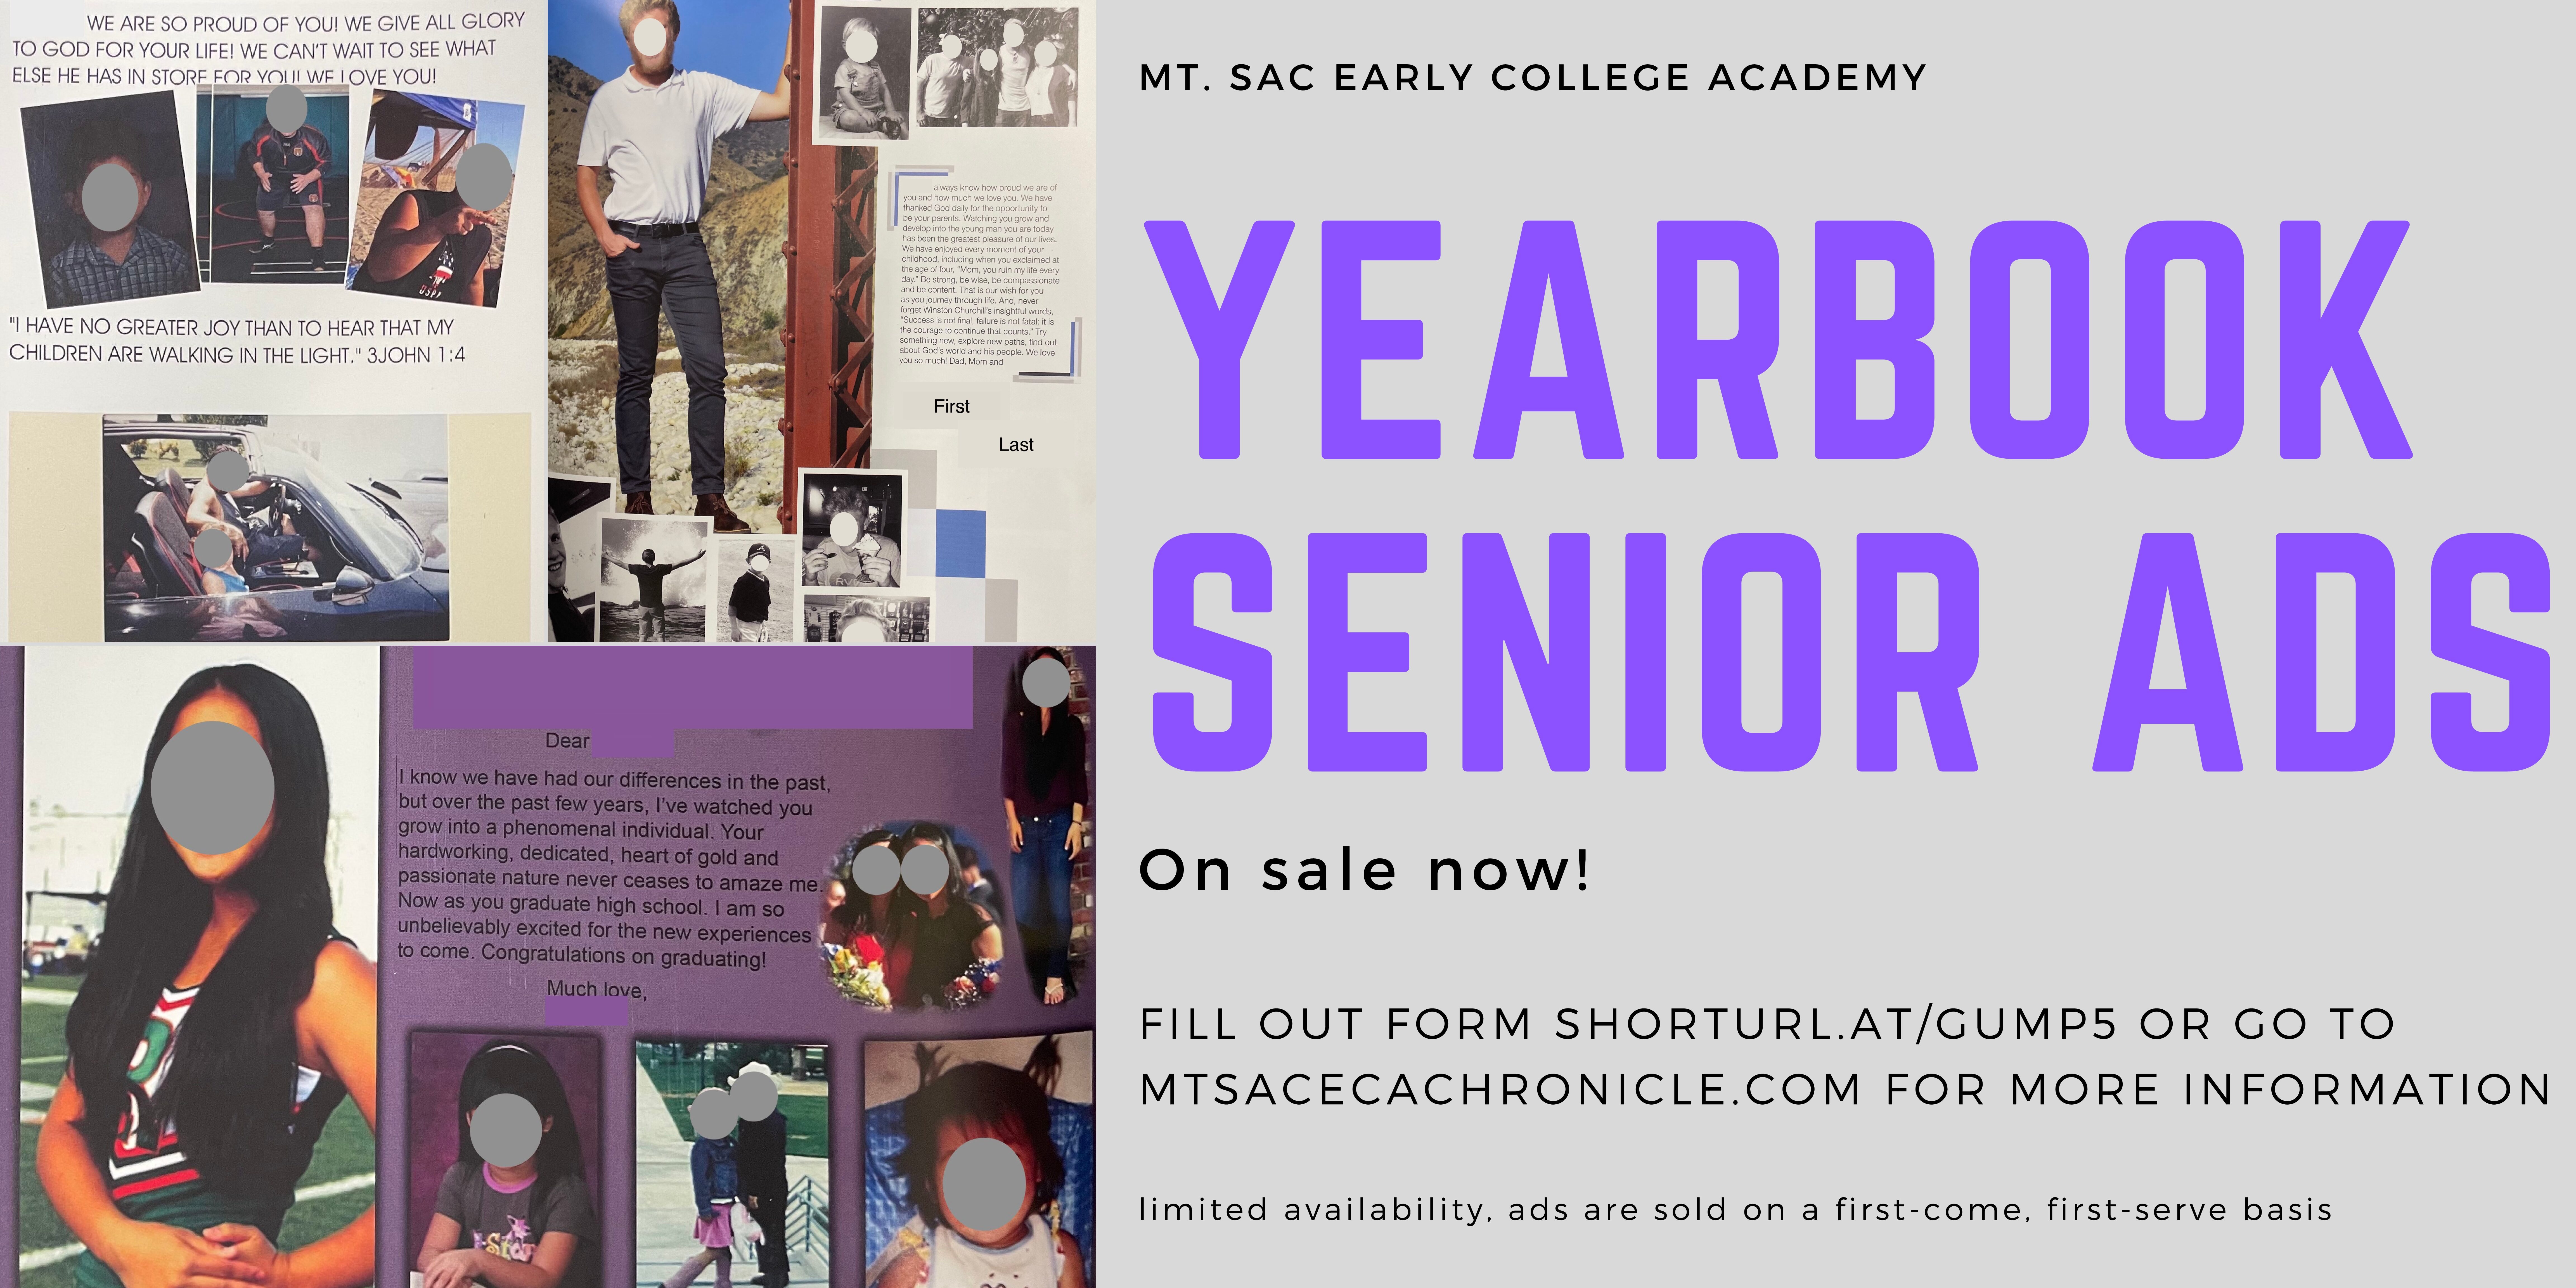 Yearbook Senior Ads